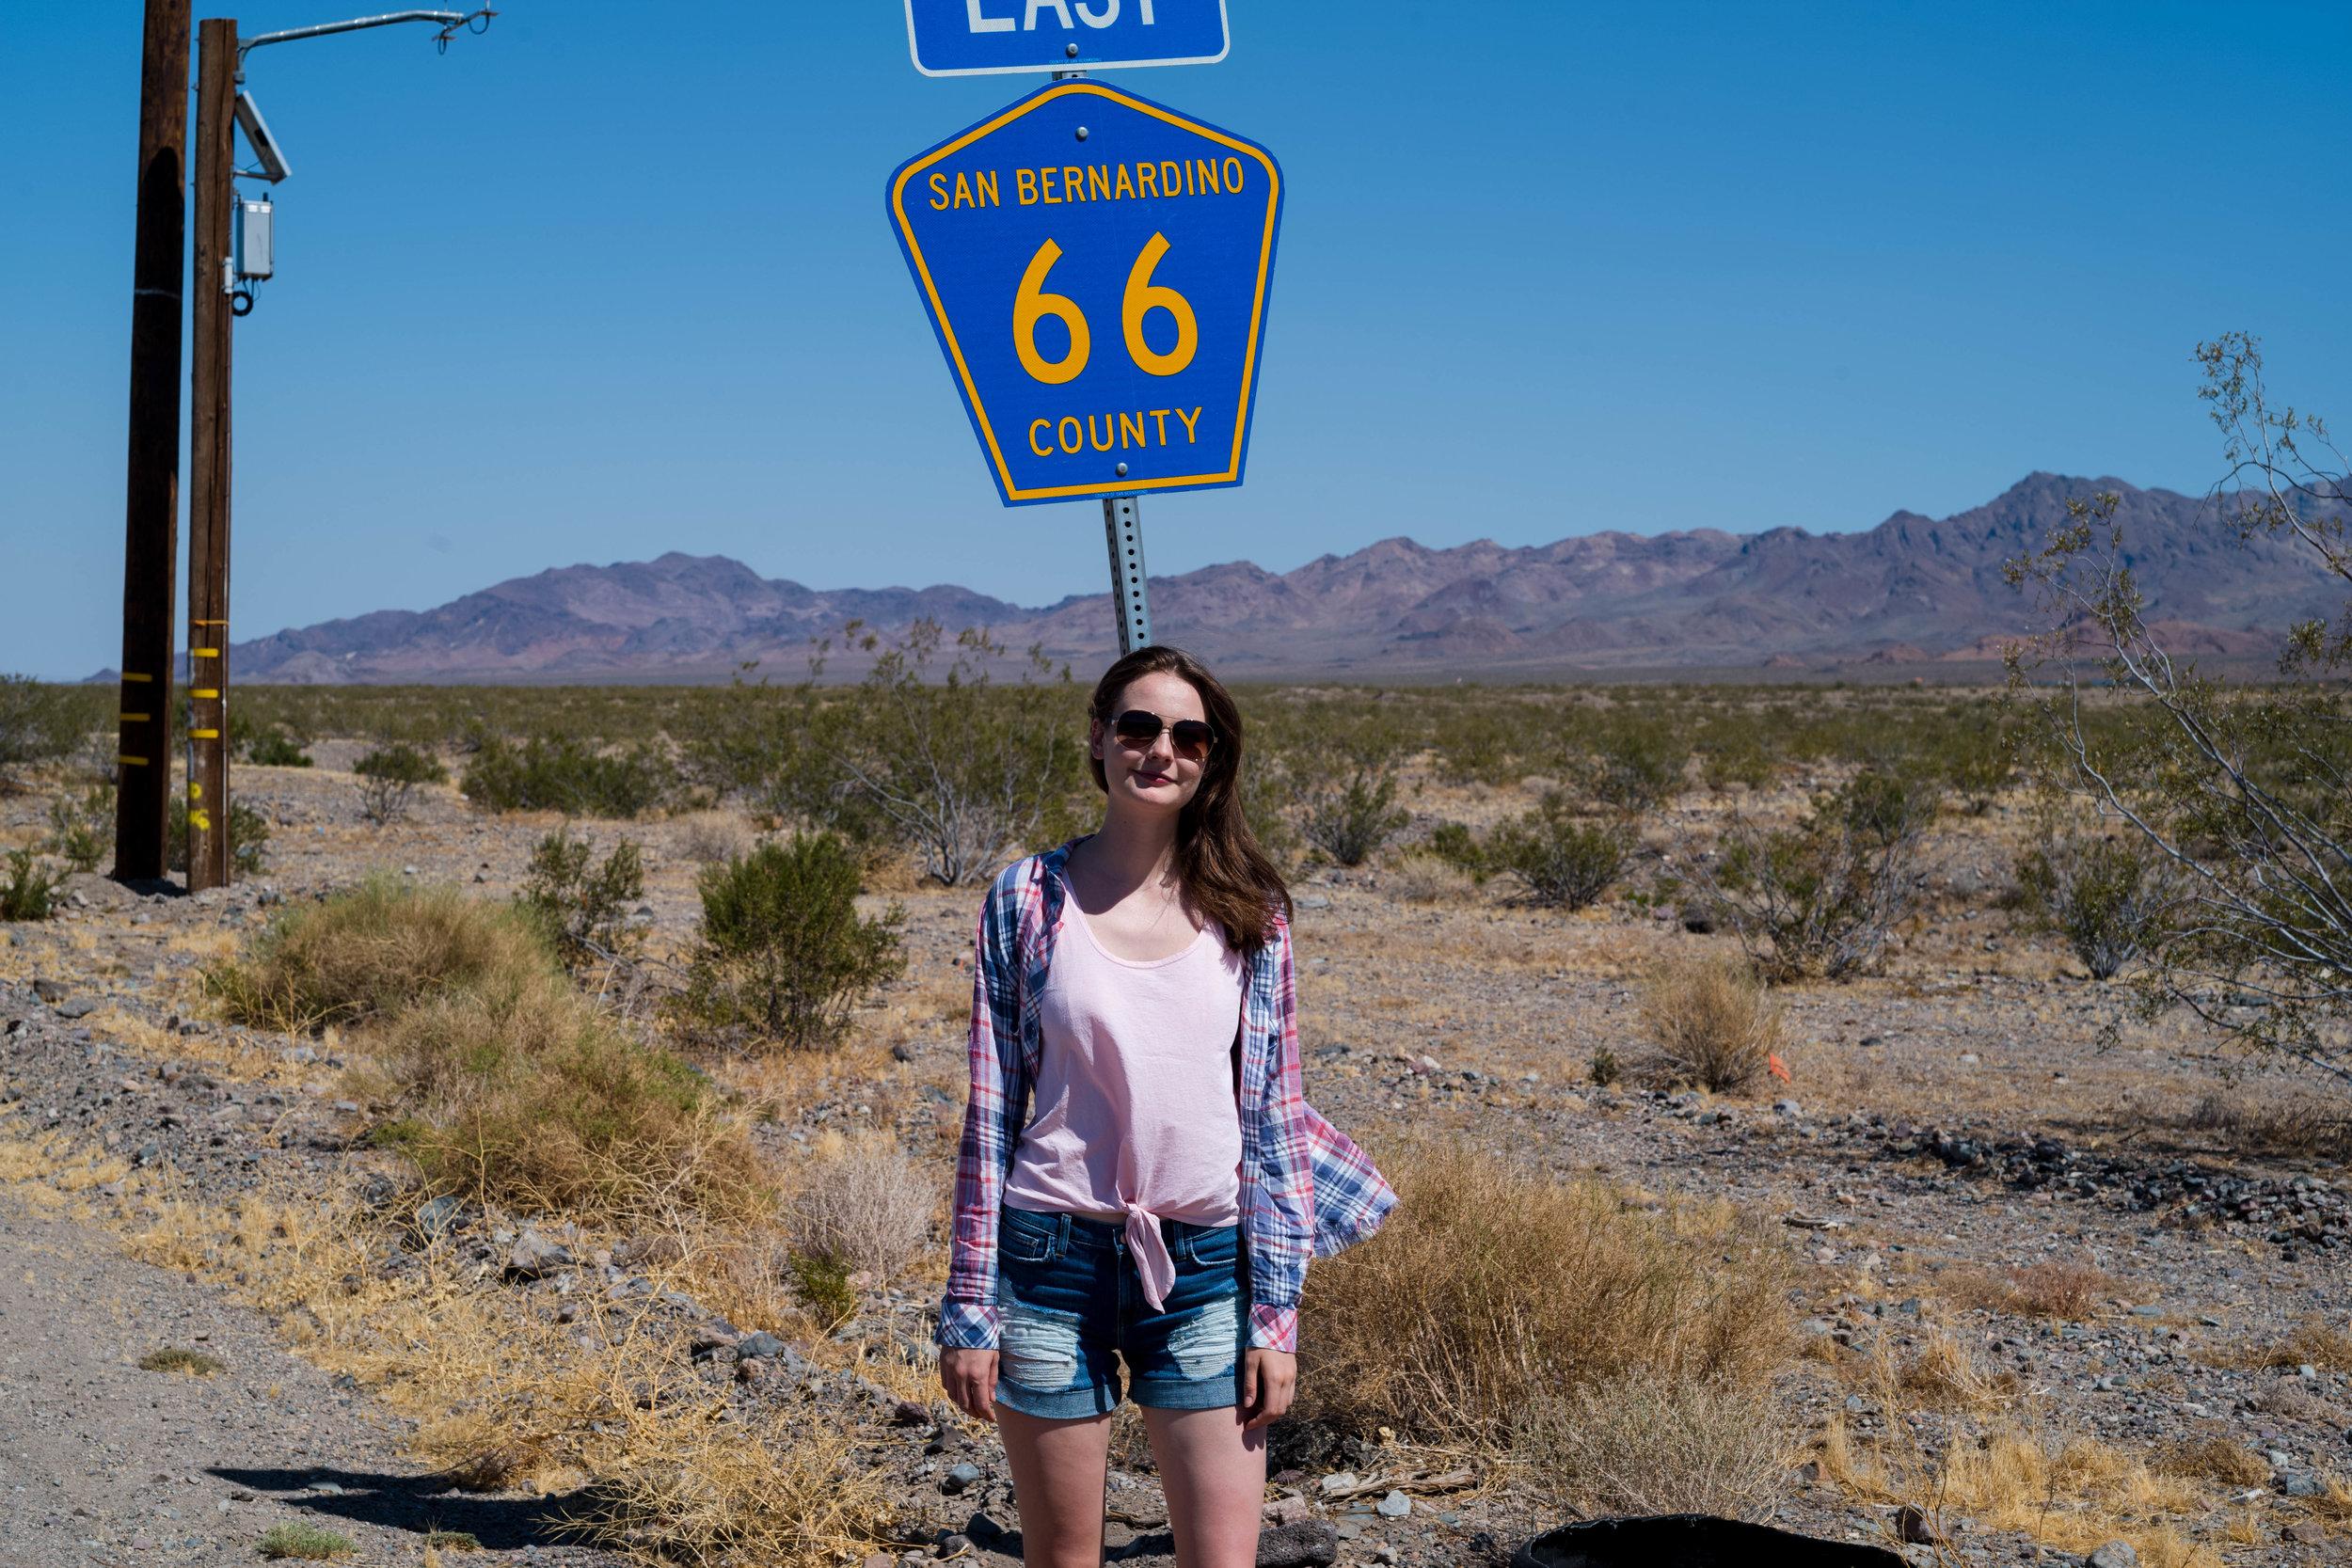 Finally, on Route 66. Leica APO 50mm f/2 Summicron ASPH